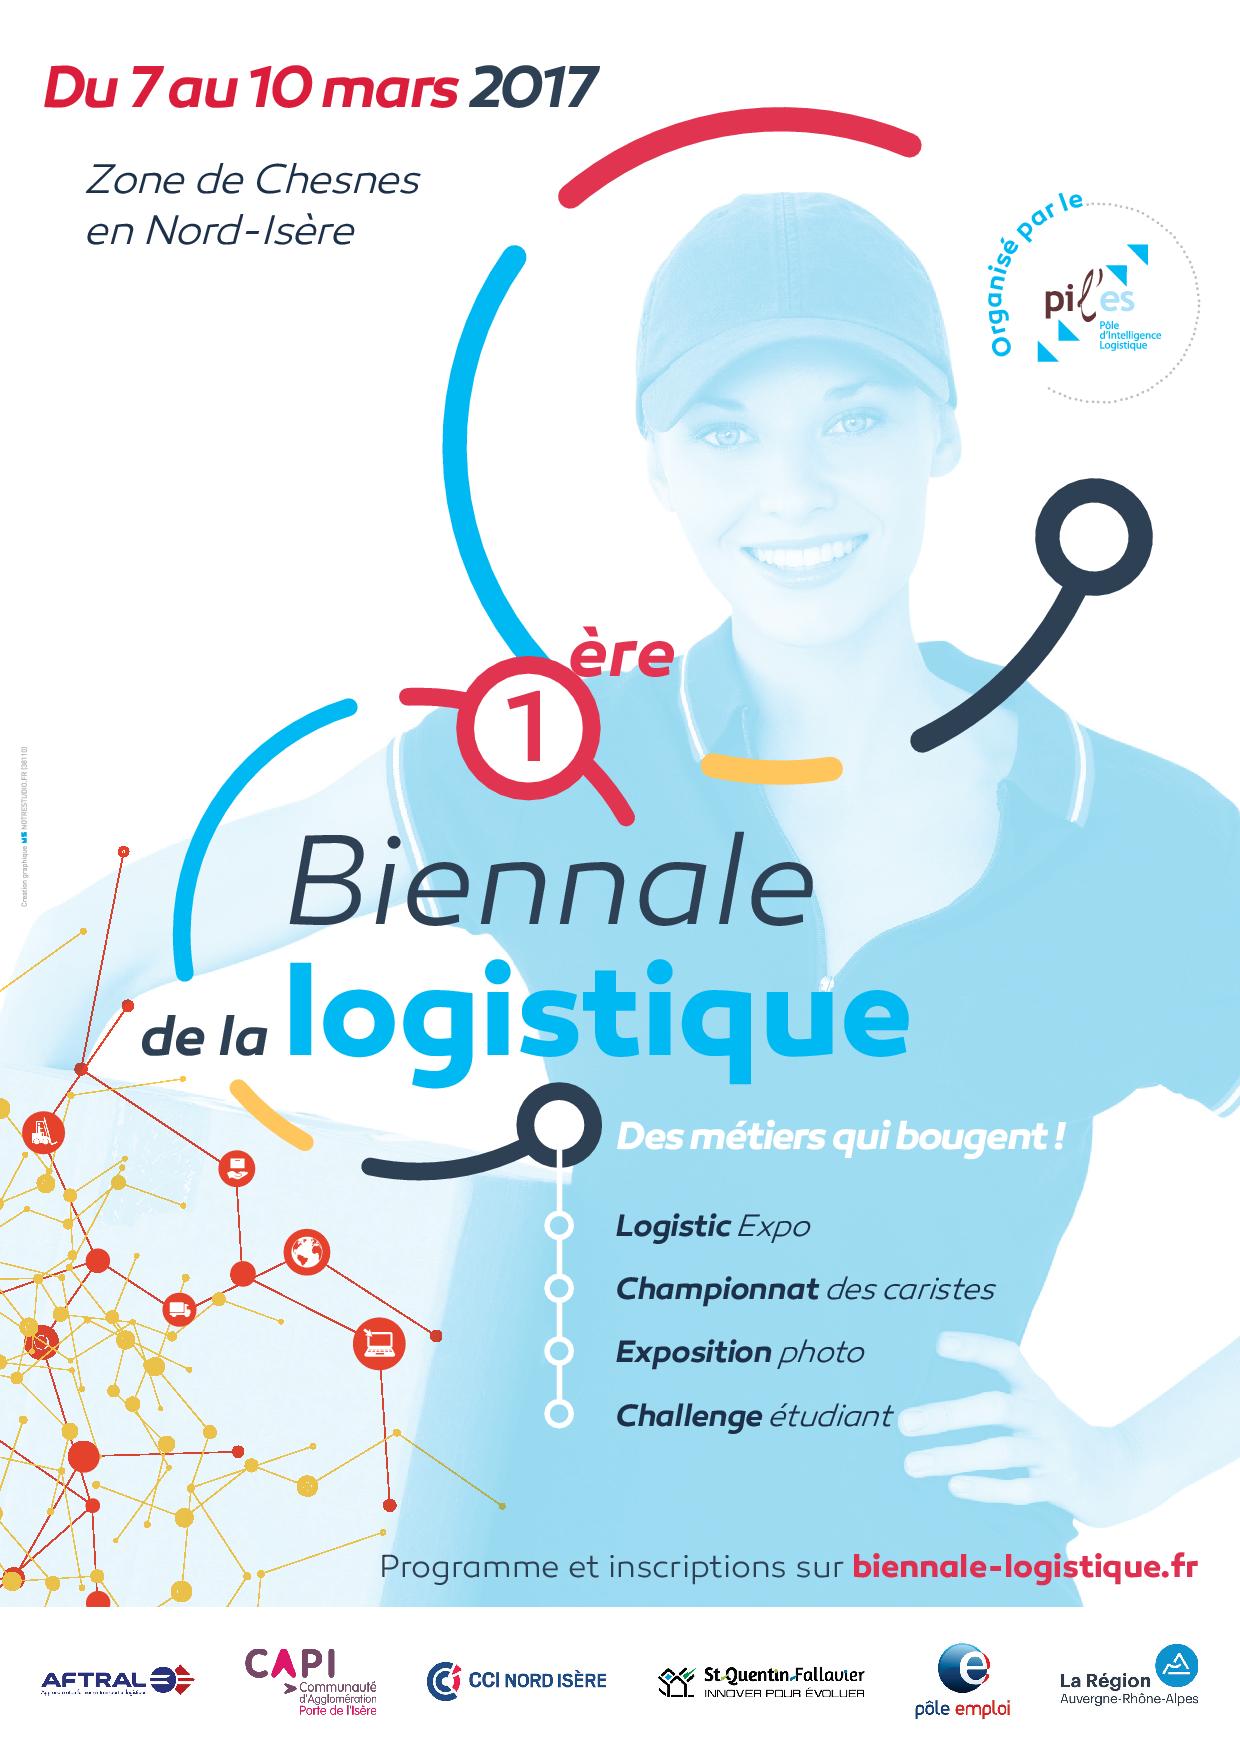 Logistic Expo - Saint Quentin Fallavier